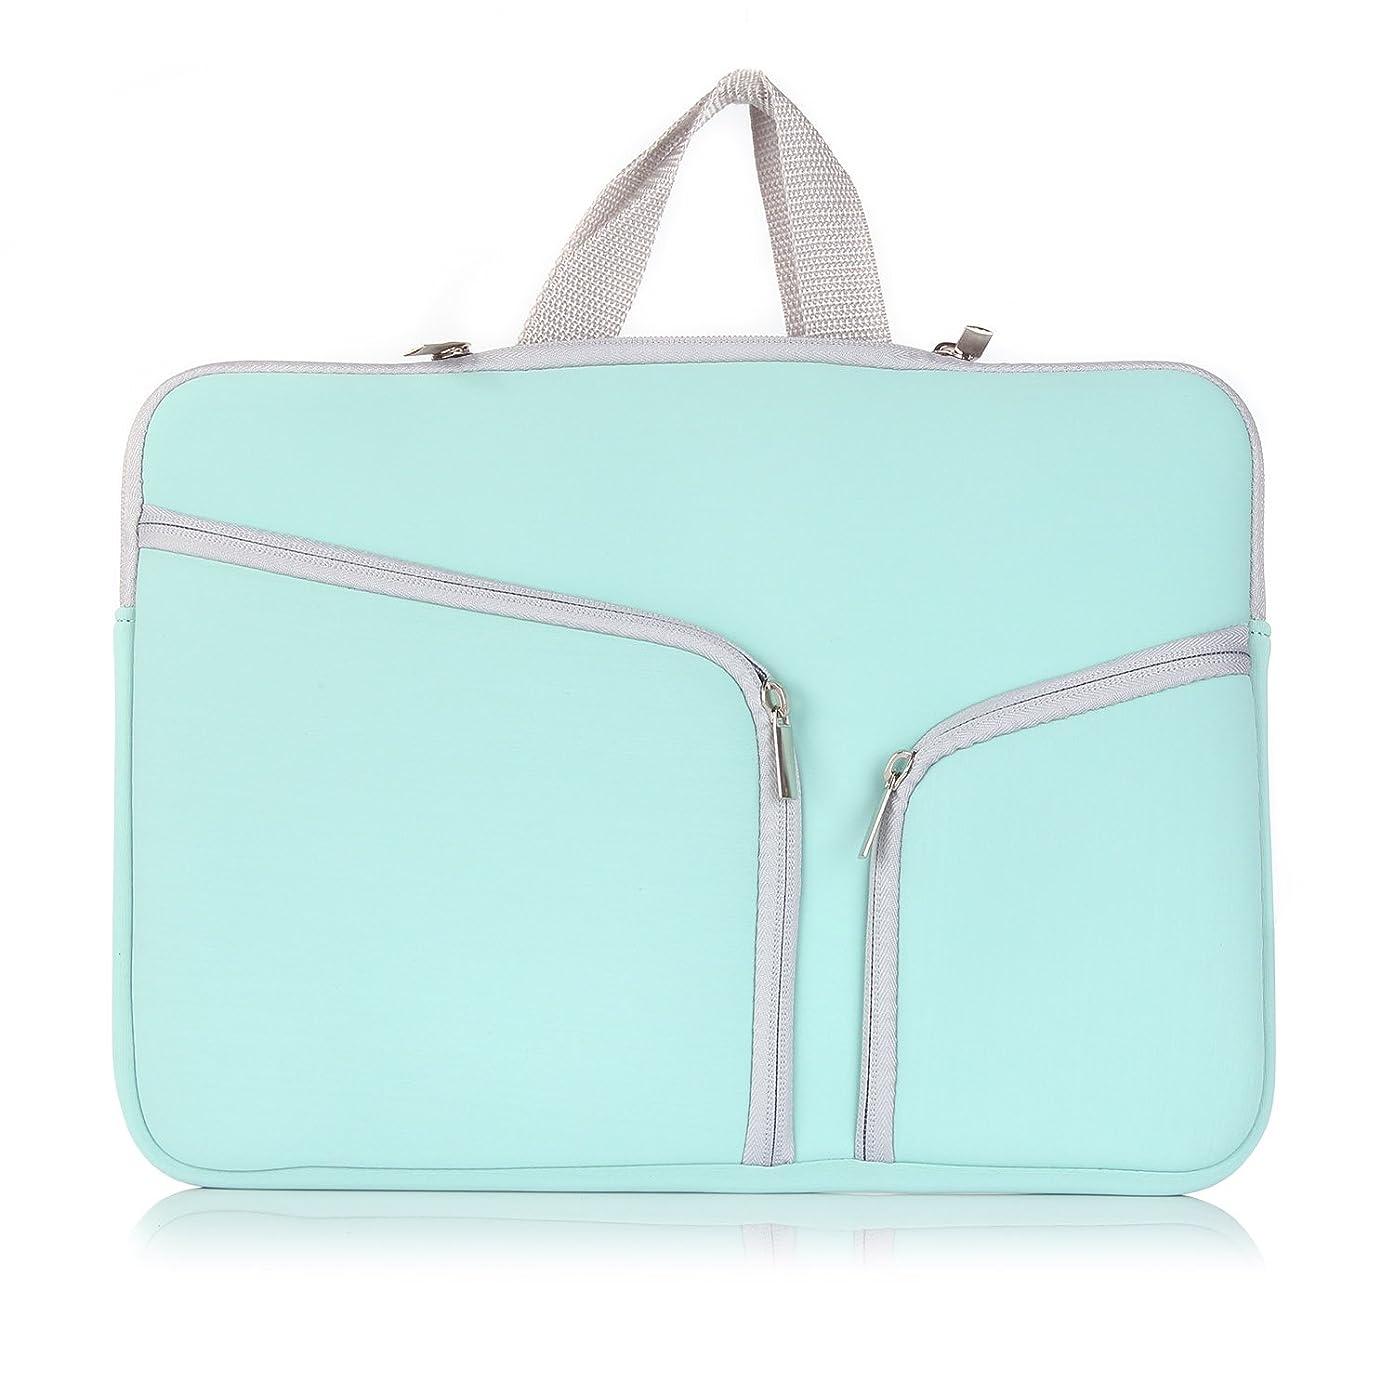 Binguowang 13.3 inch Laptop Sleeve Case Notebook Bag with Zipper for Macbook air 13